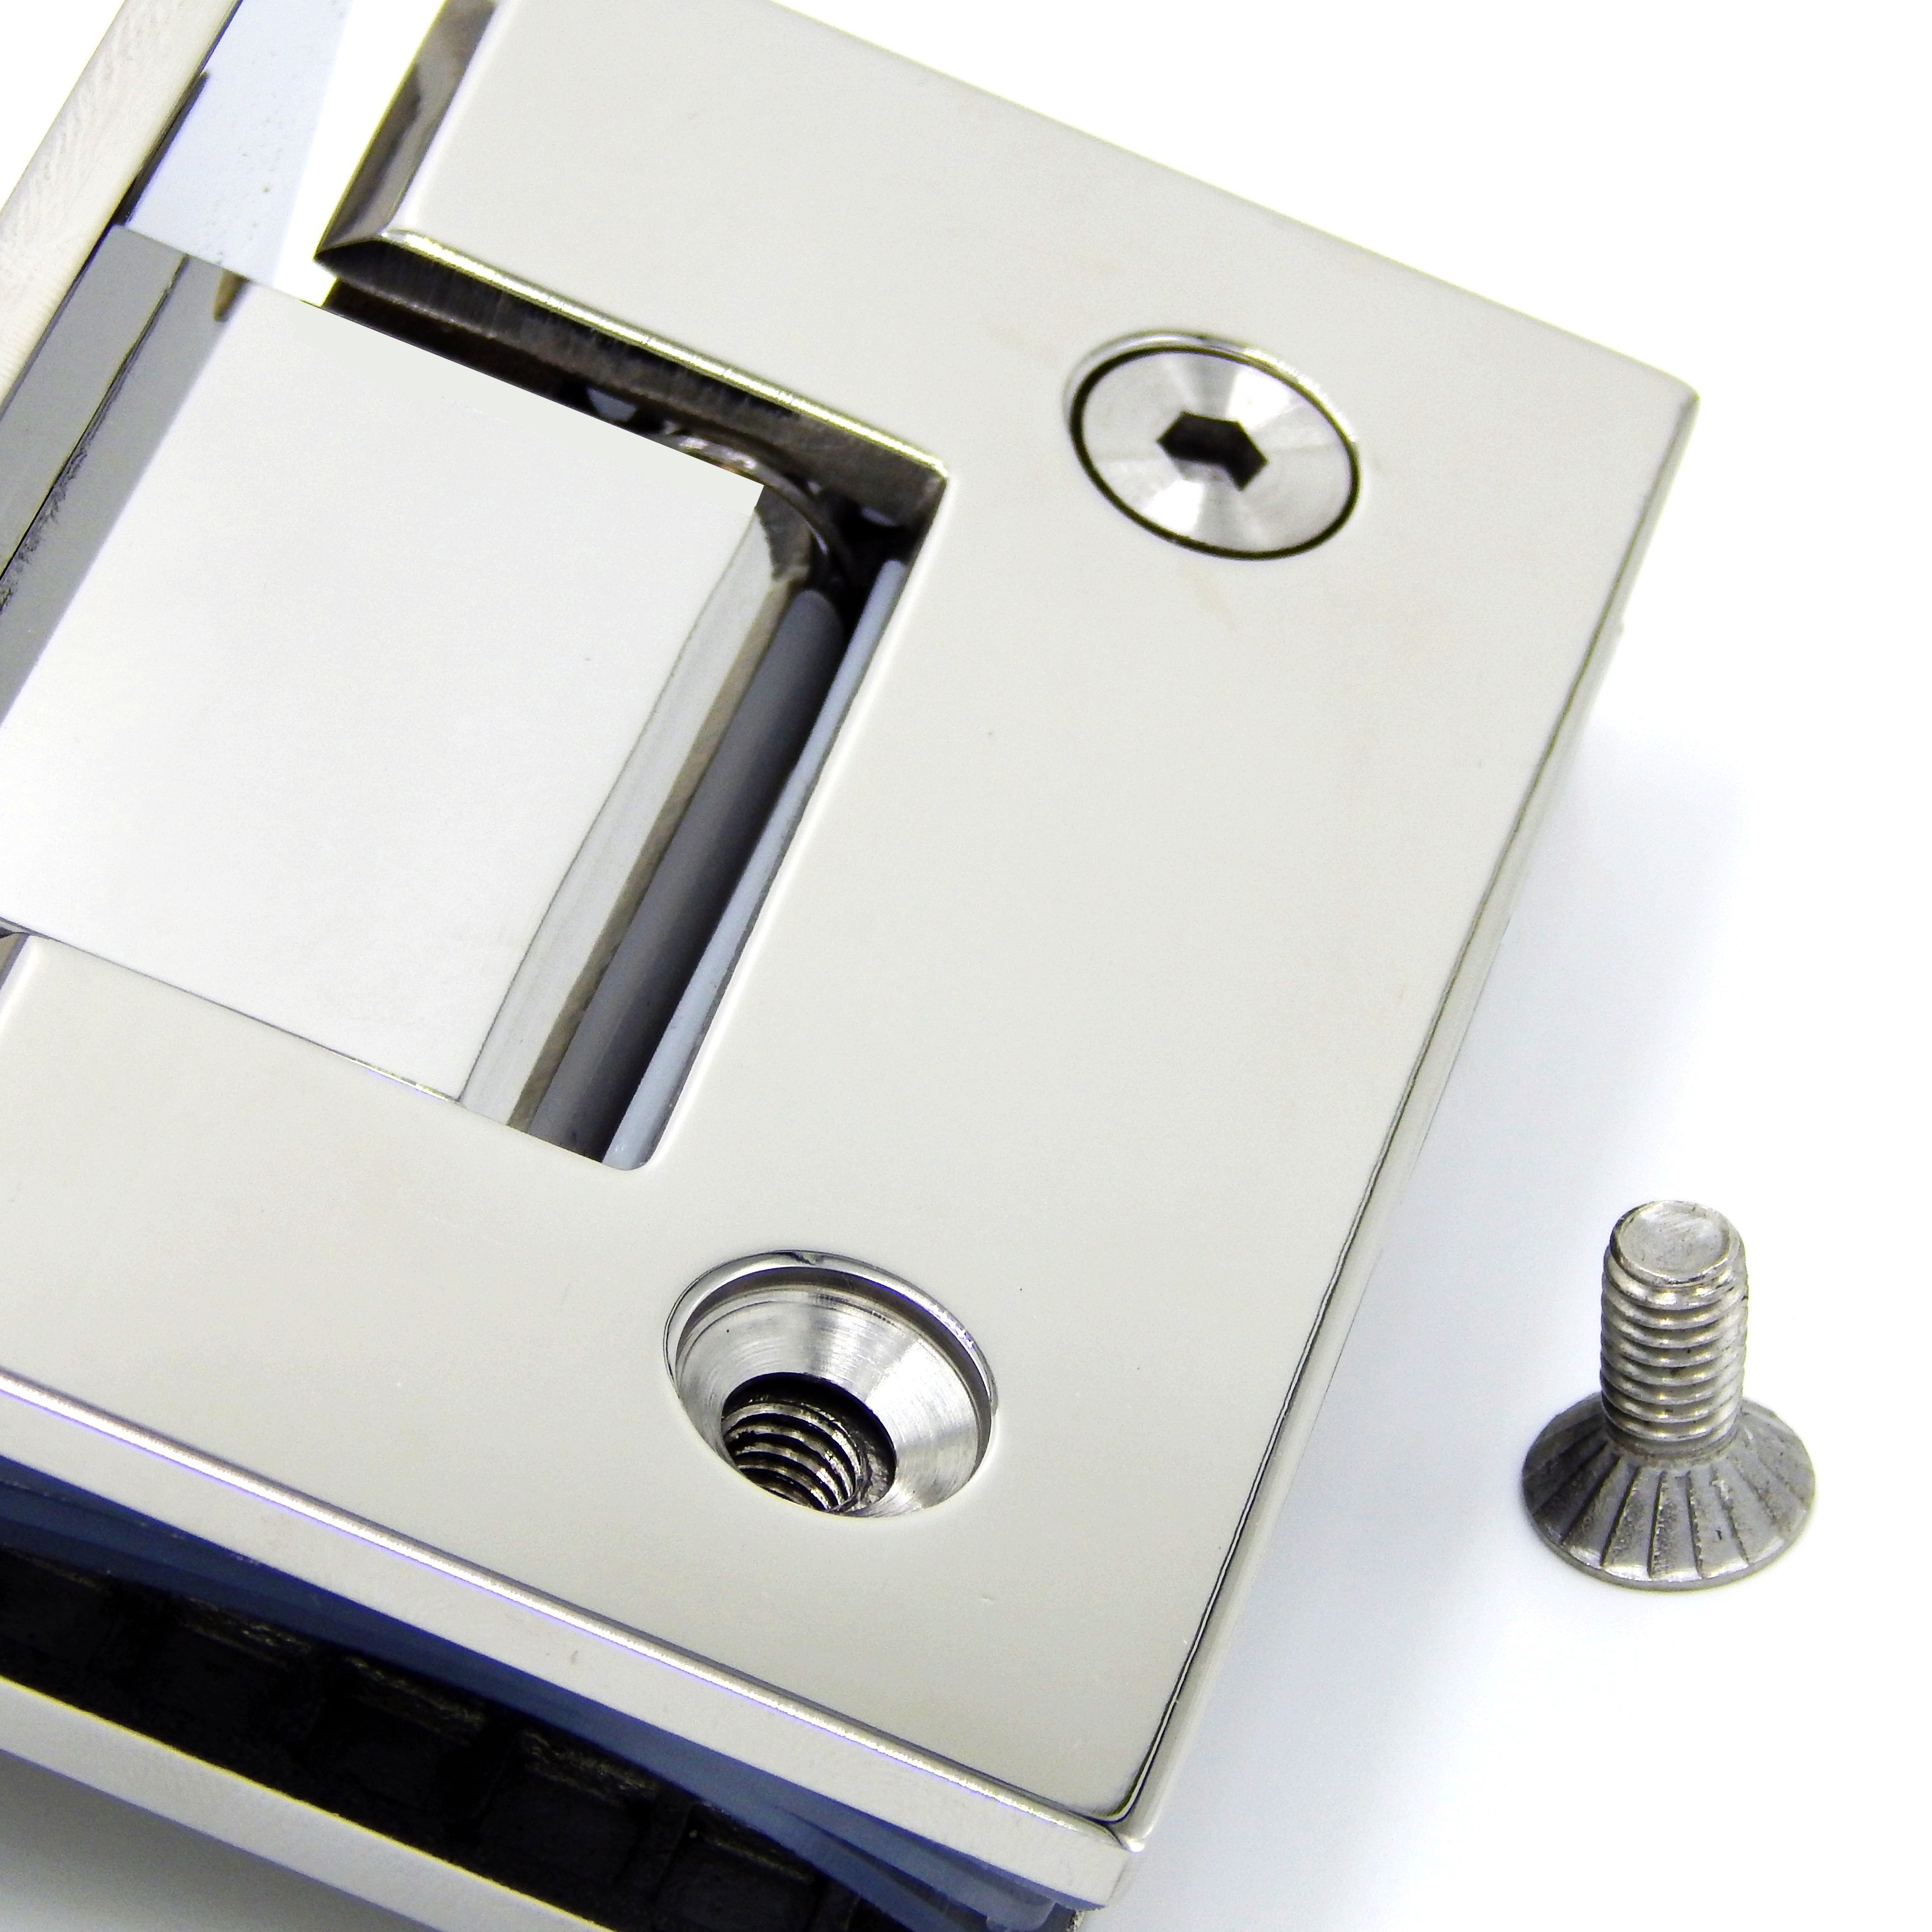 Stainless Steel  Degrees Of Bathroom Clamp Mirror Light Mirror - Bathroom door hinges